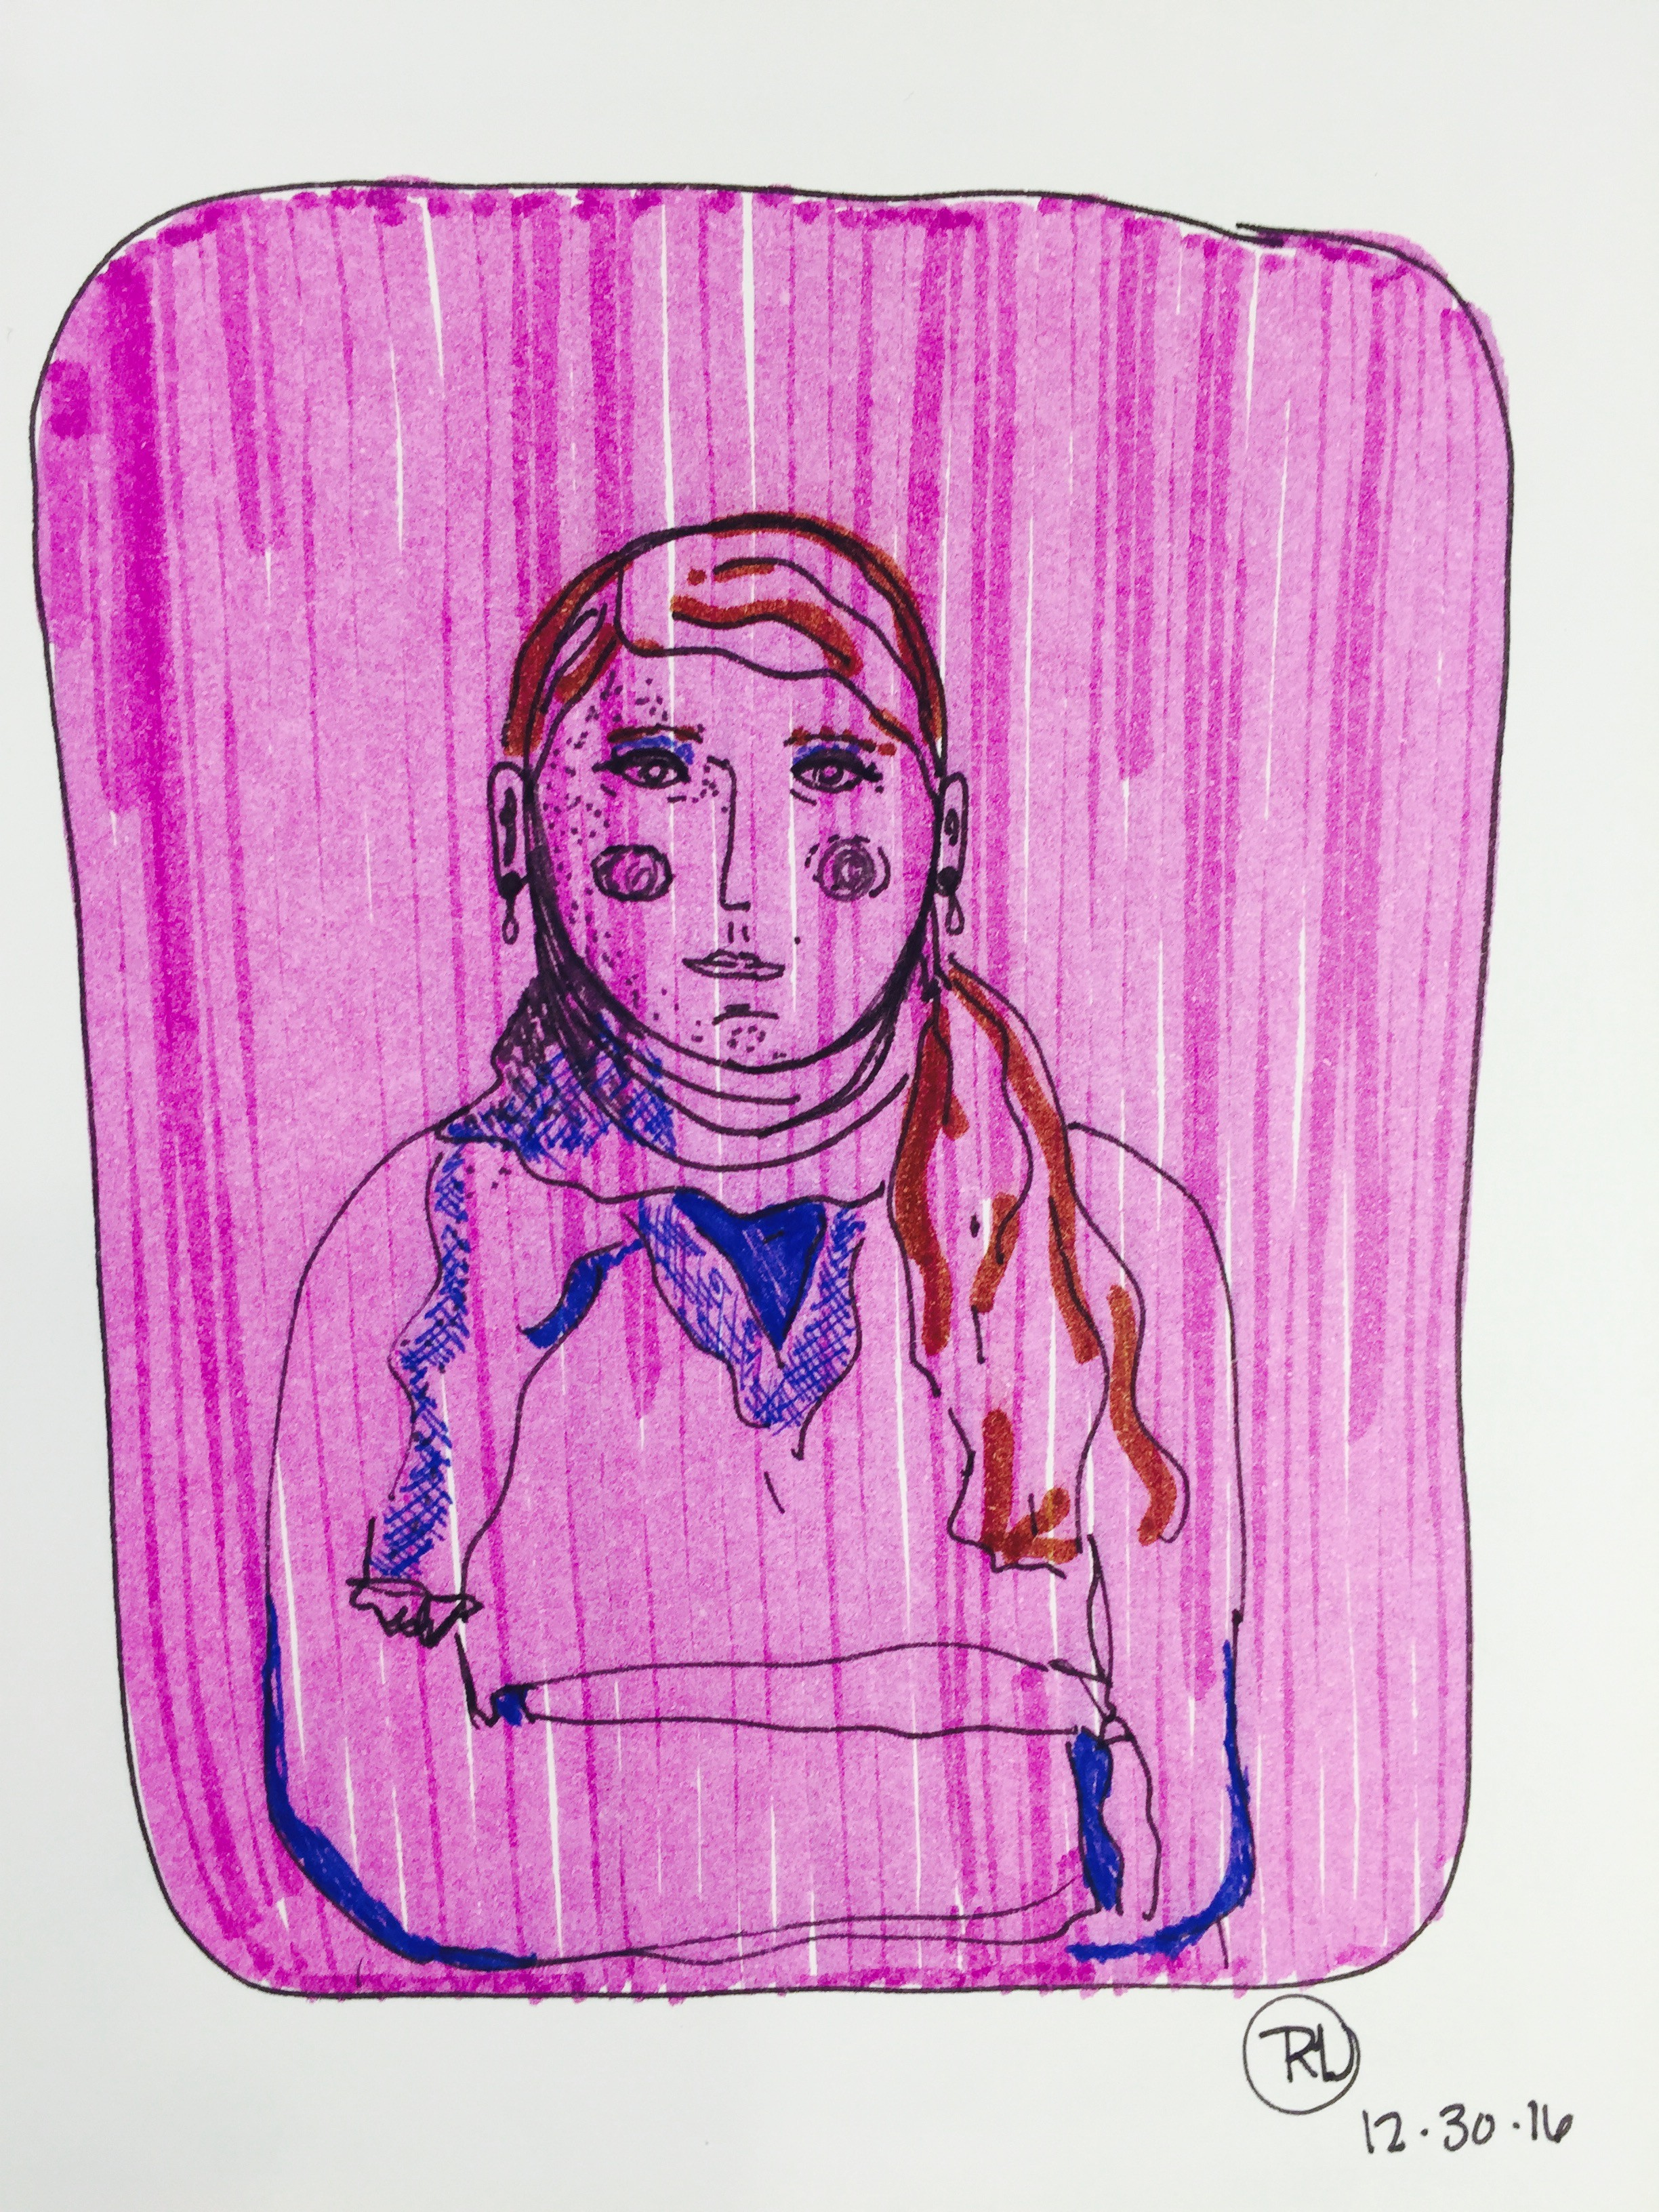 flight attendant - using my daughter's Crayola markers + Stabilo pt 88 pen